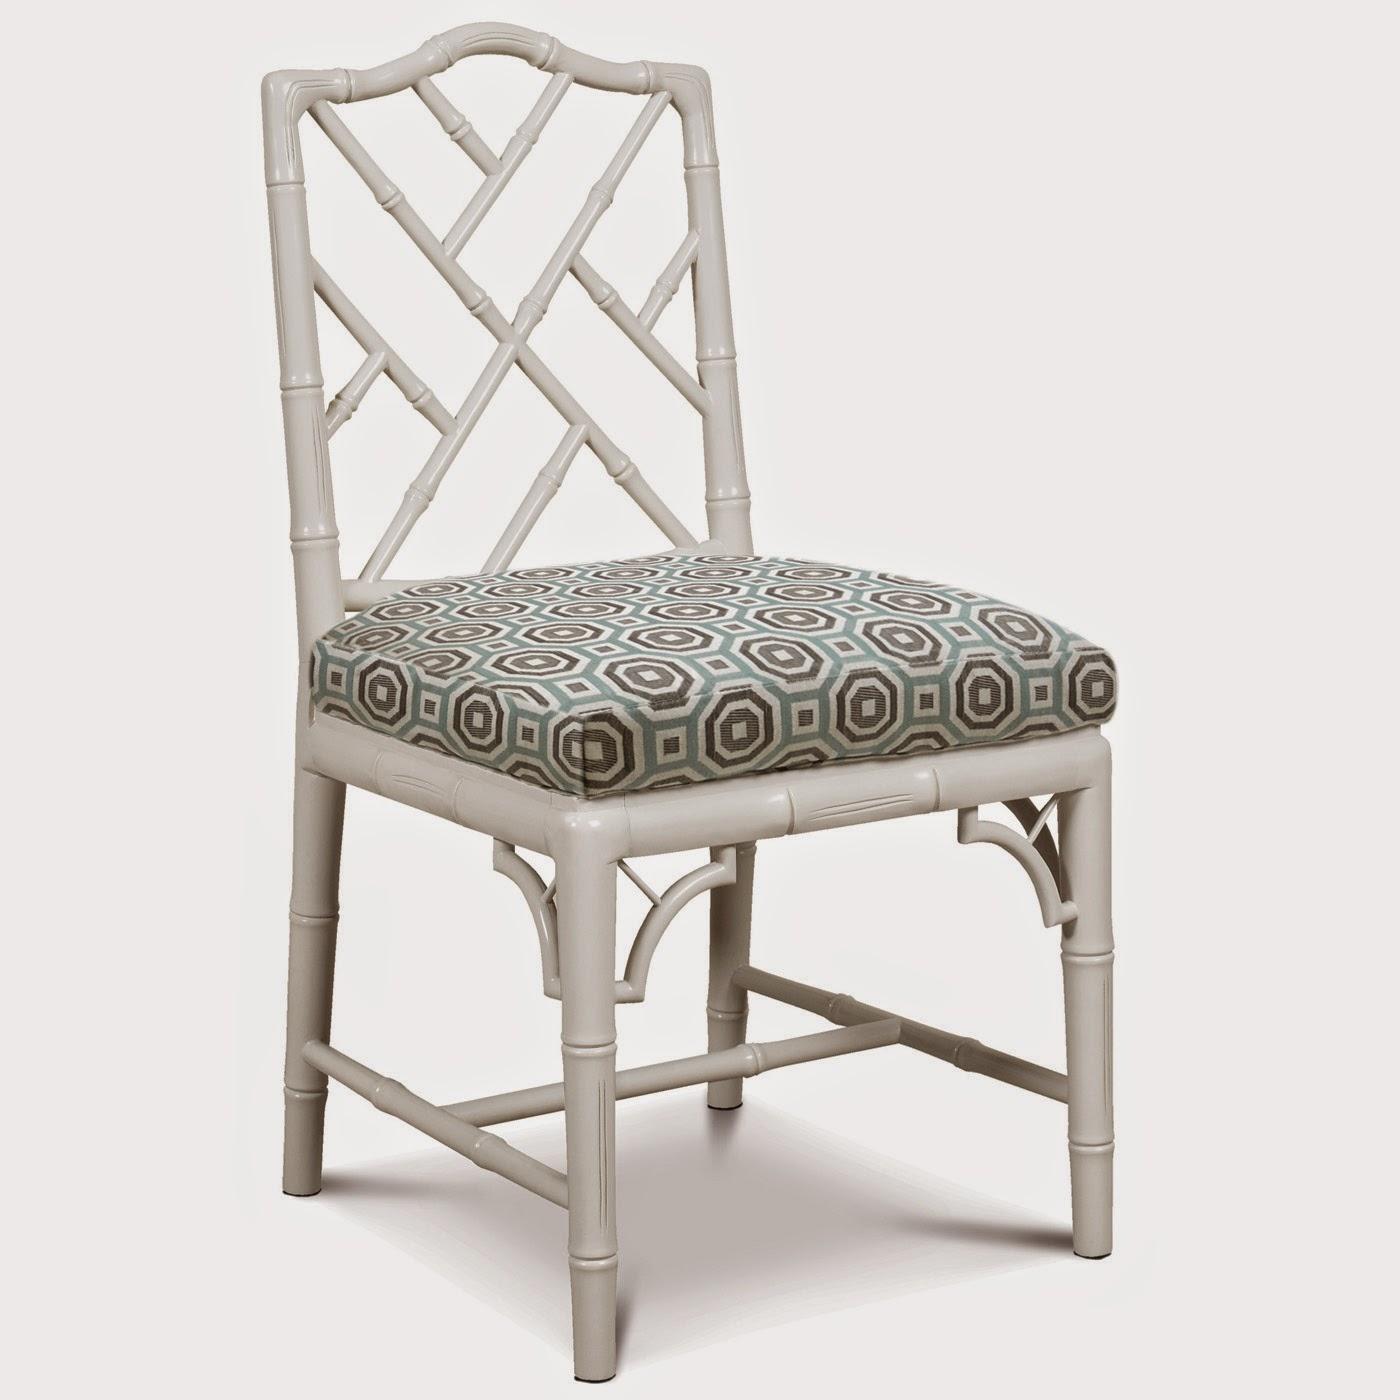 jonathan adler chair wobble research darya girina interior design color palette of